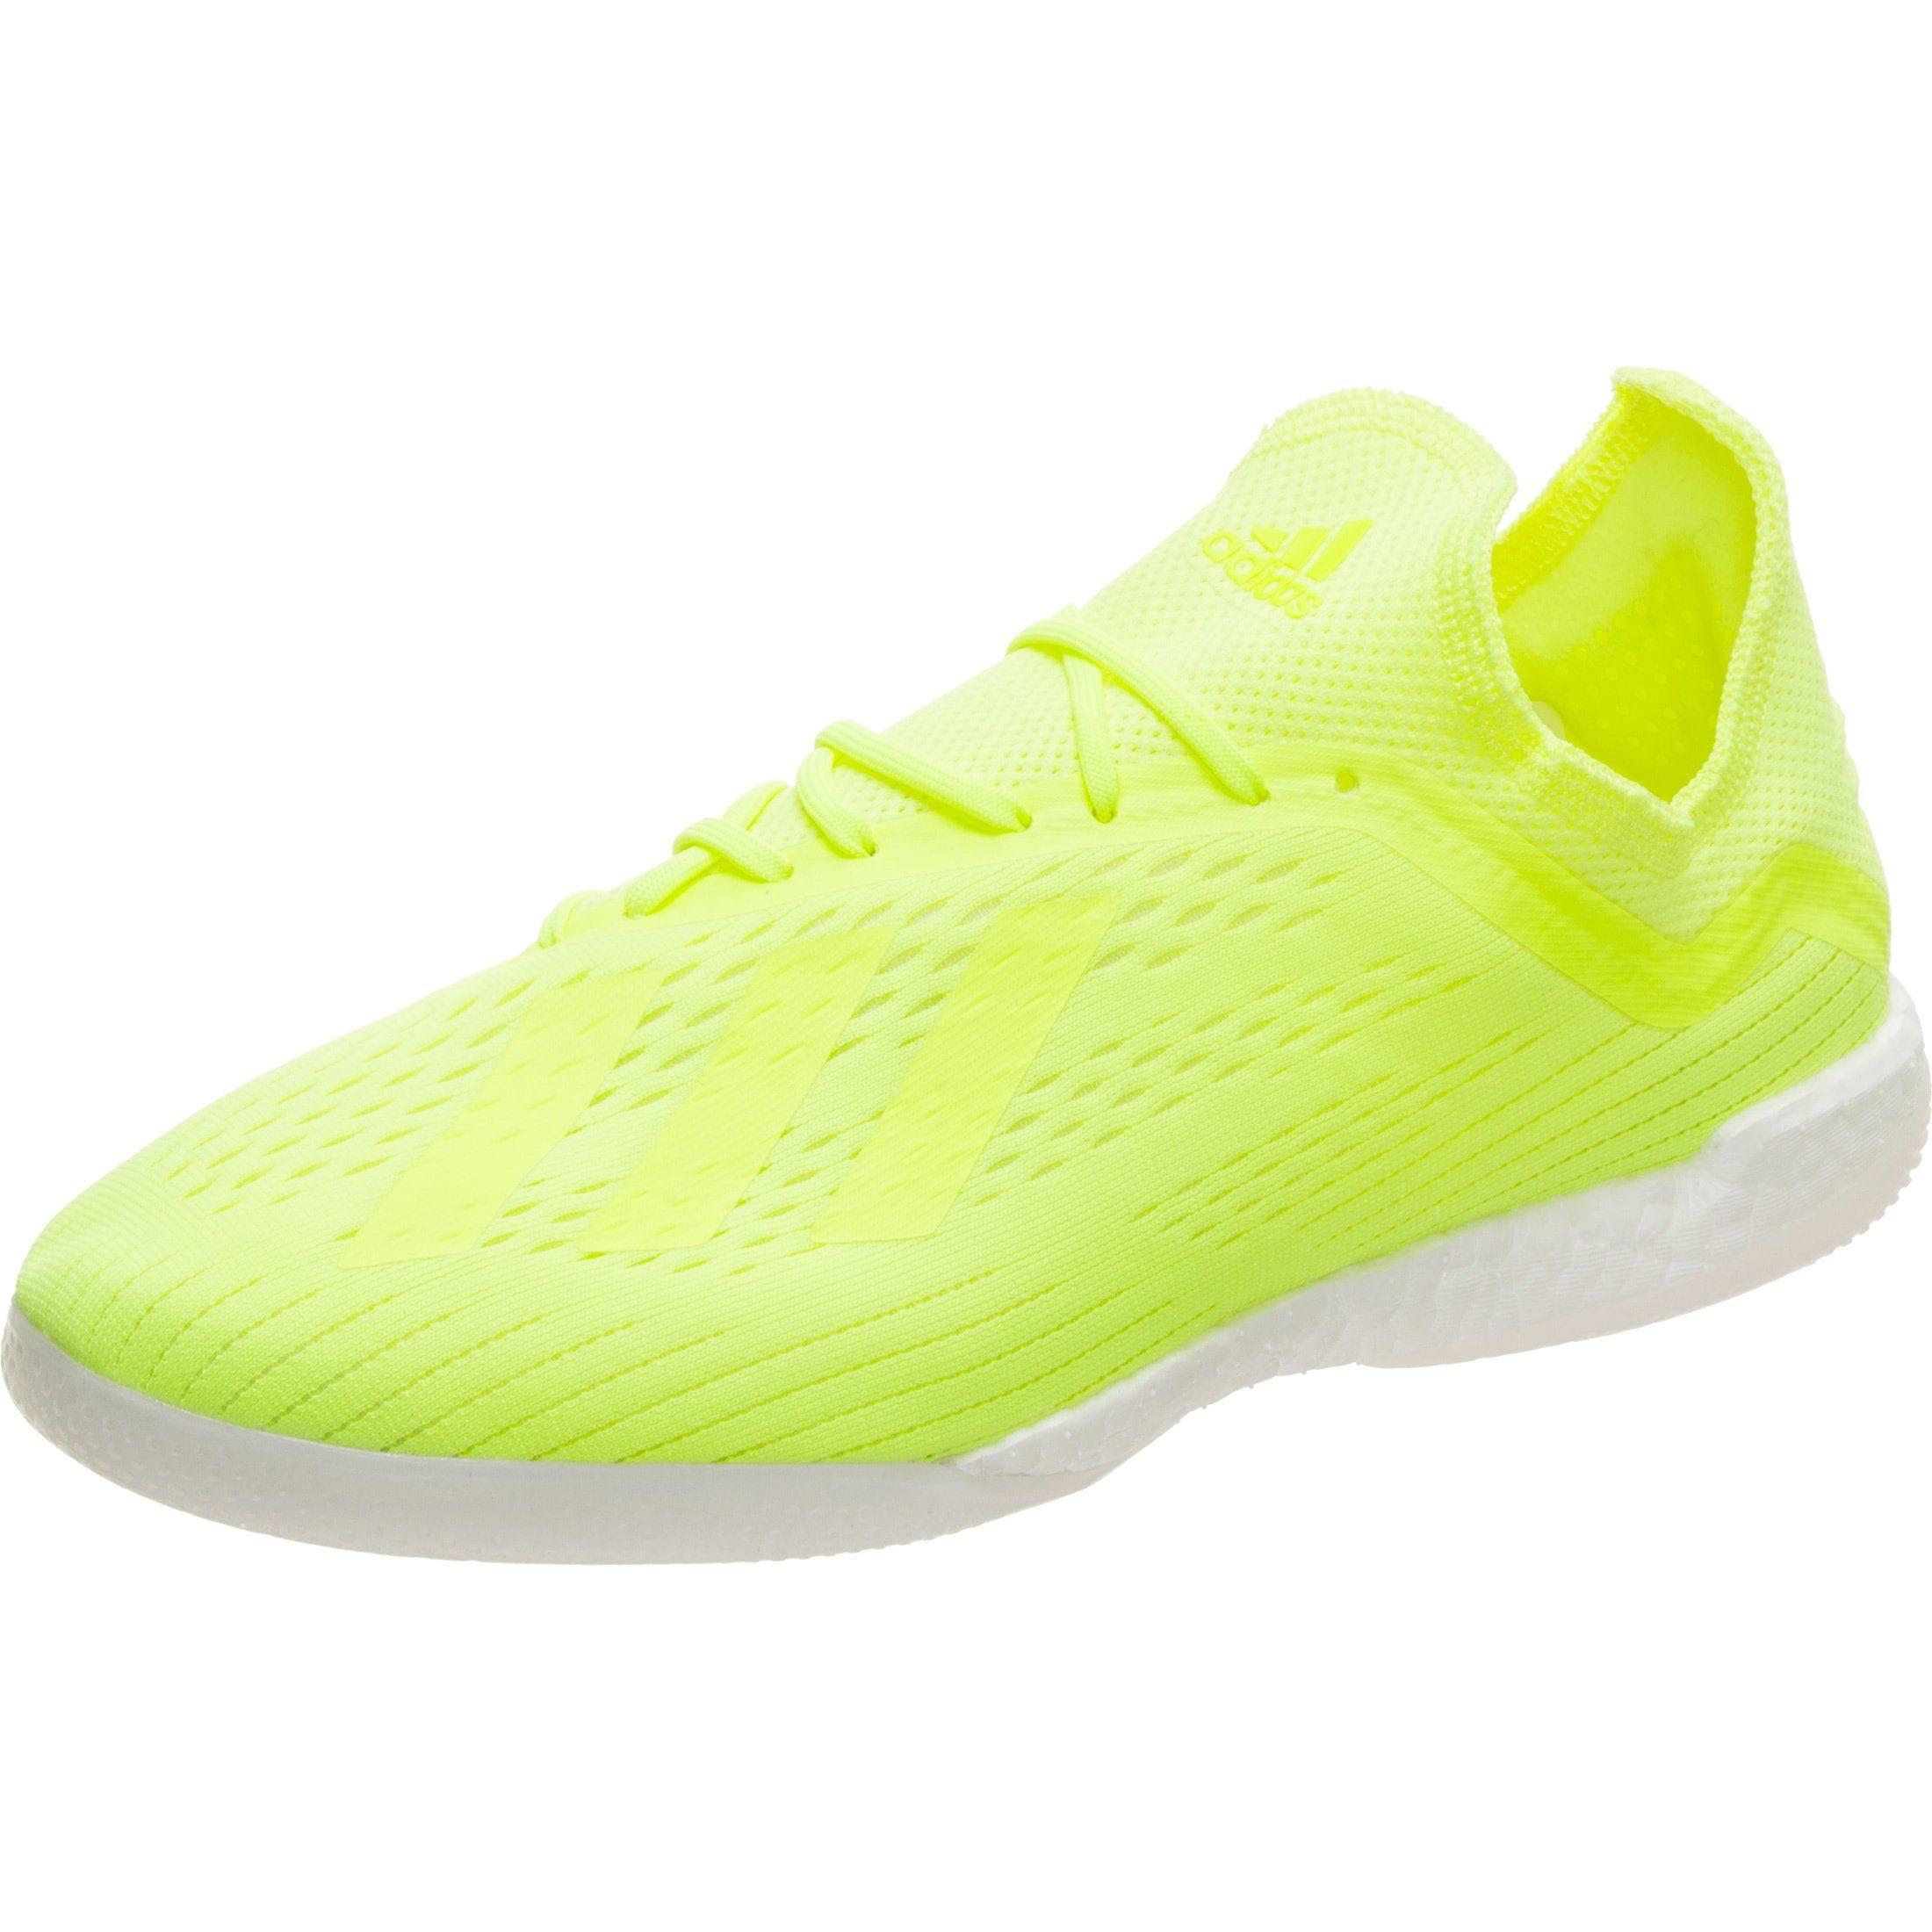 adidas Performance Fußballschuh X Tango 181 Tr   Schuhe > Sportschuhe > Fußballschuhe   Gelb   Adidas Performance